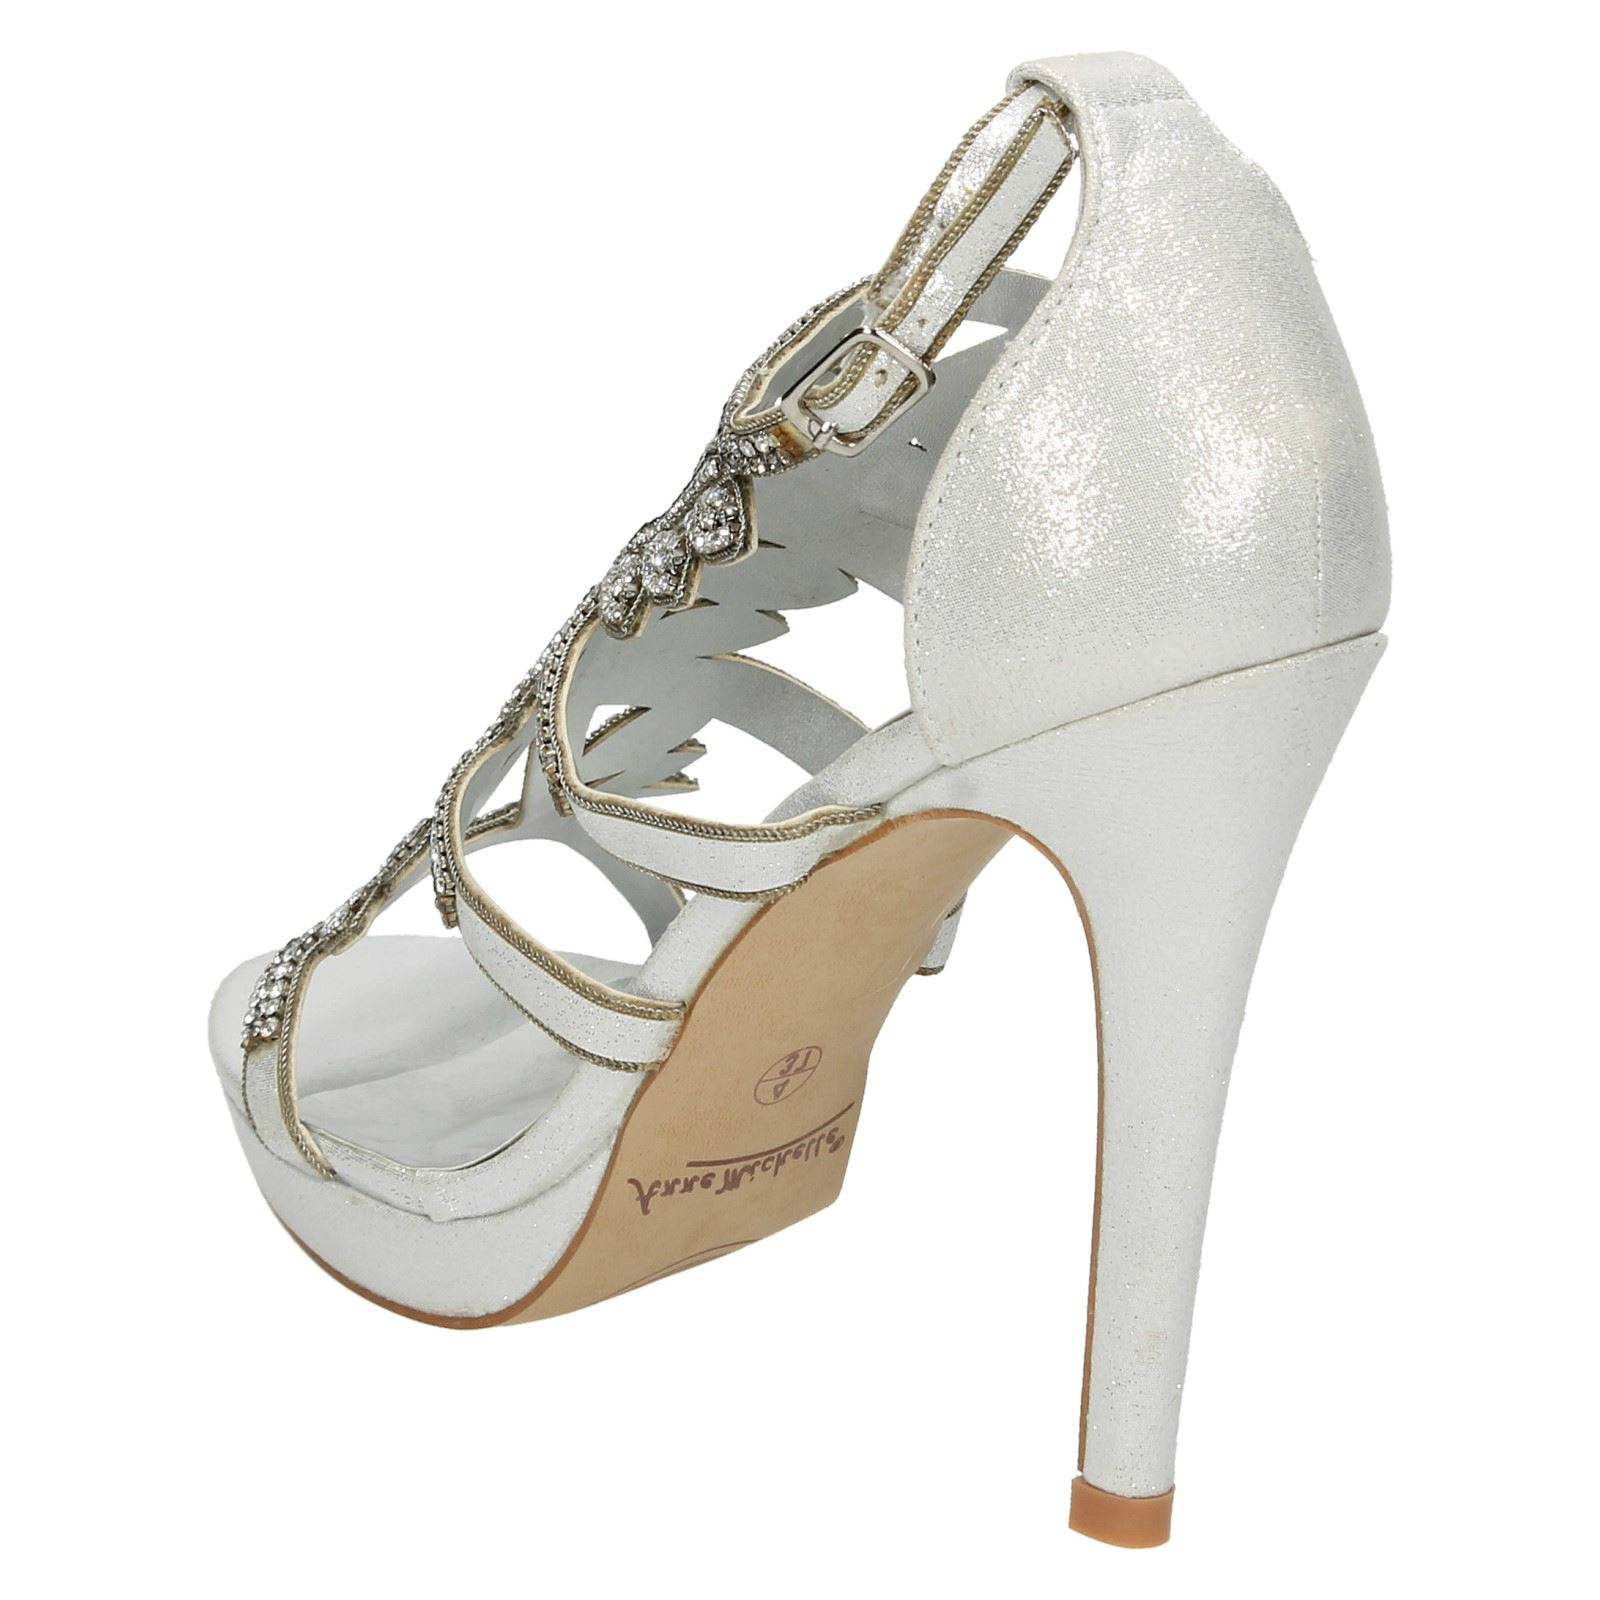 Ladies Anne Michelle Diamante Trim Party Heels